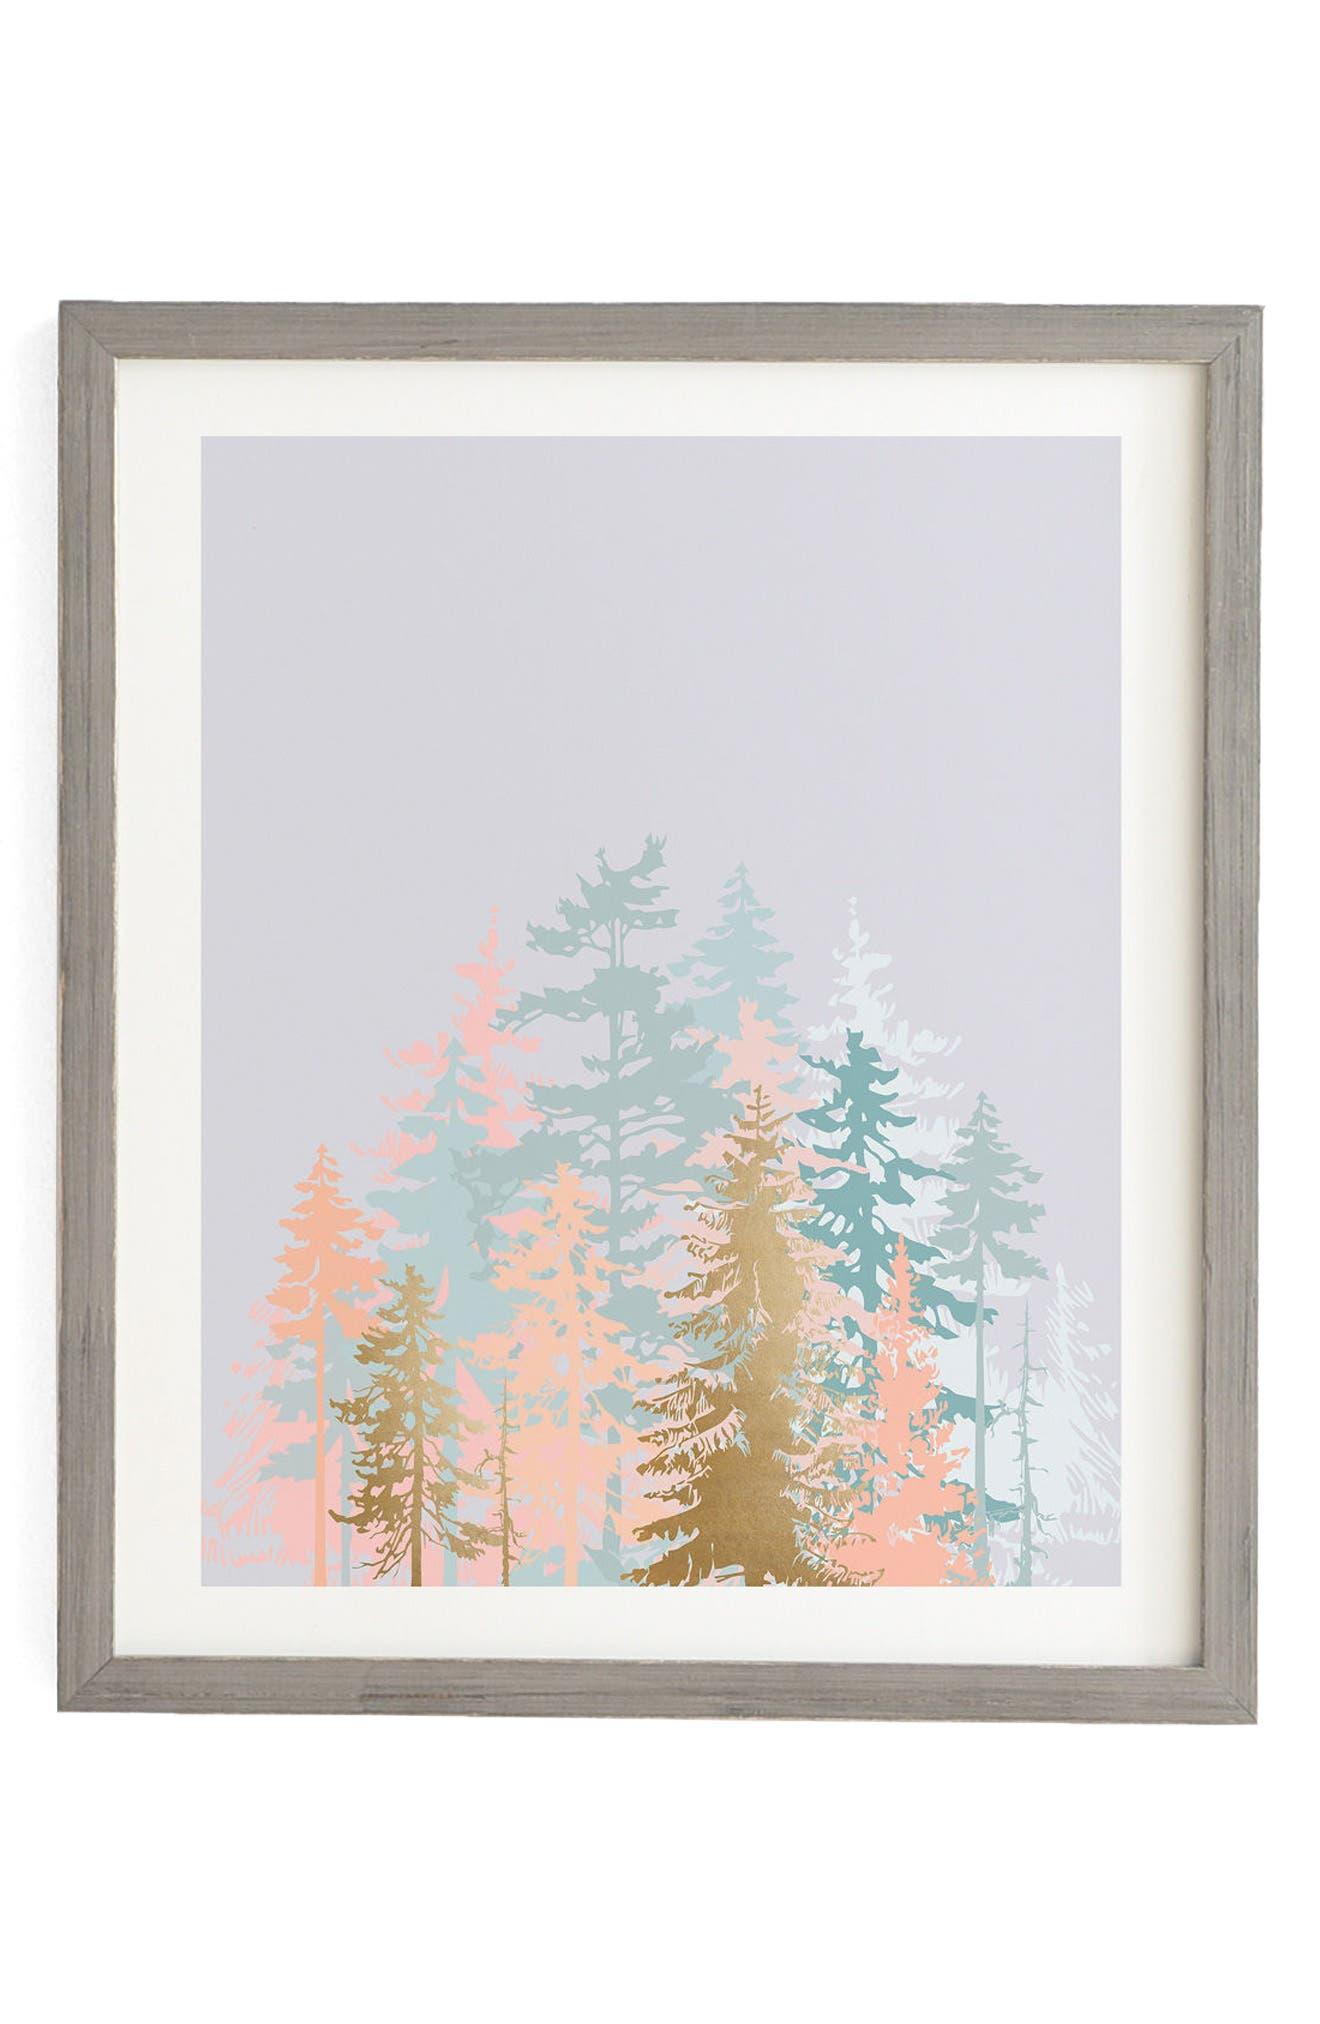 Alternate Image 1 Selected - Deny Designs Blush Forest Framed Wall Art